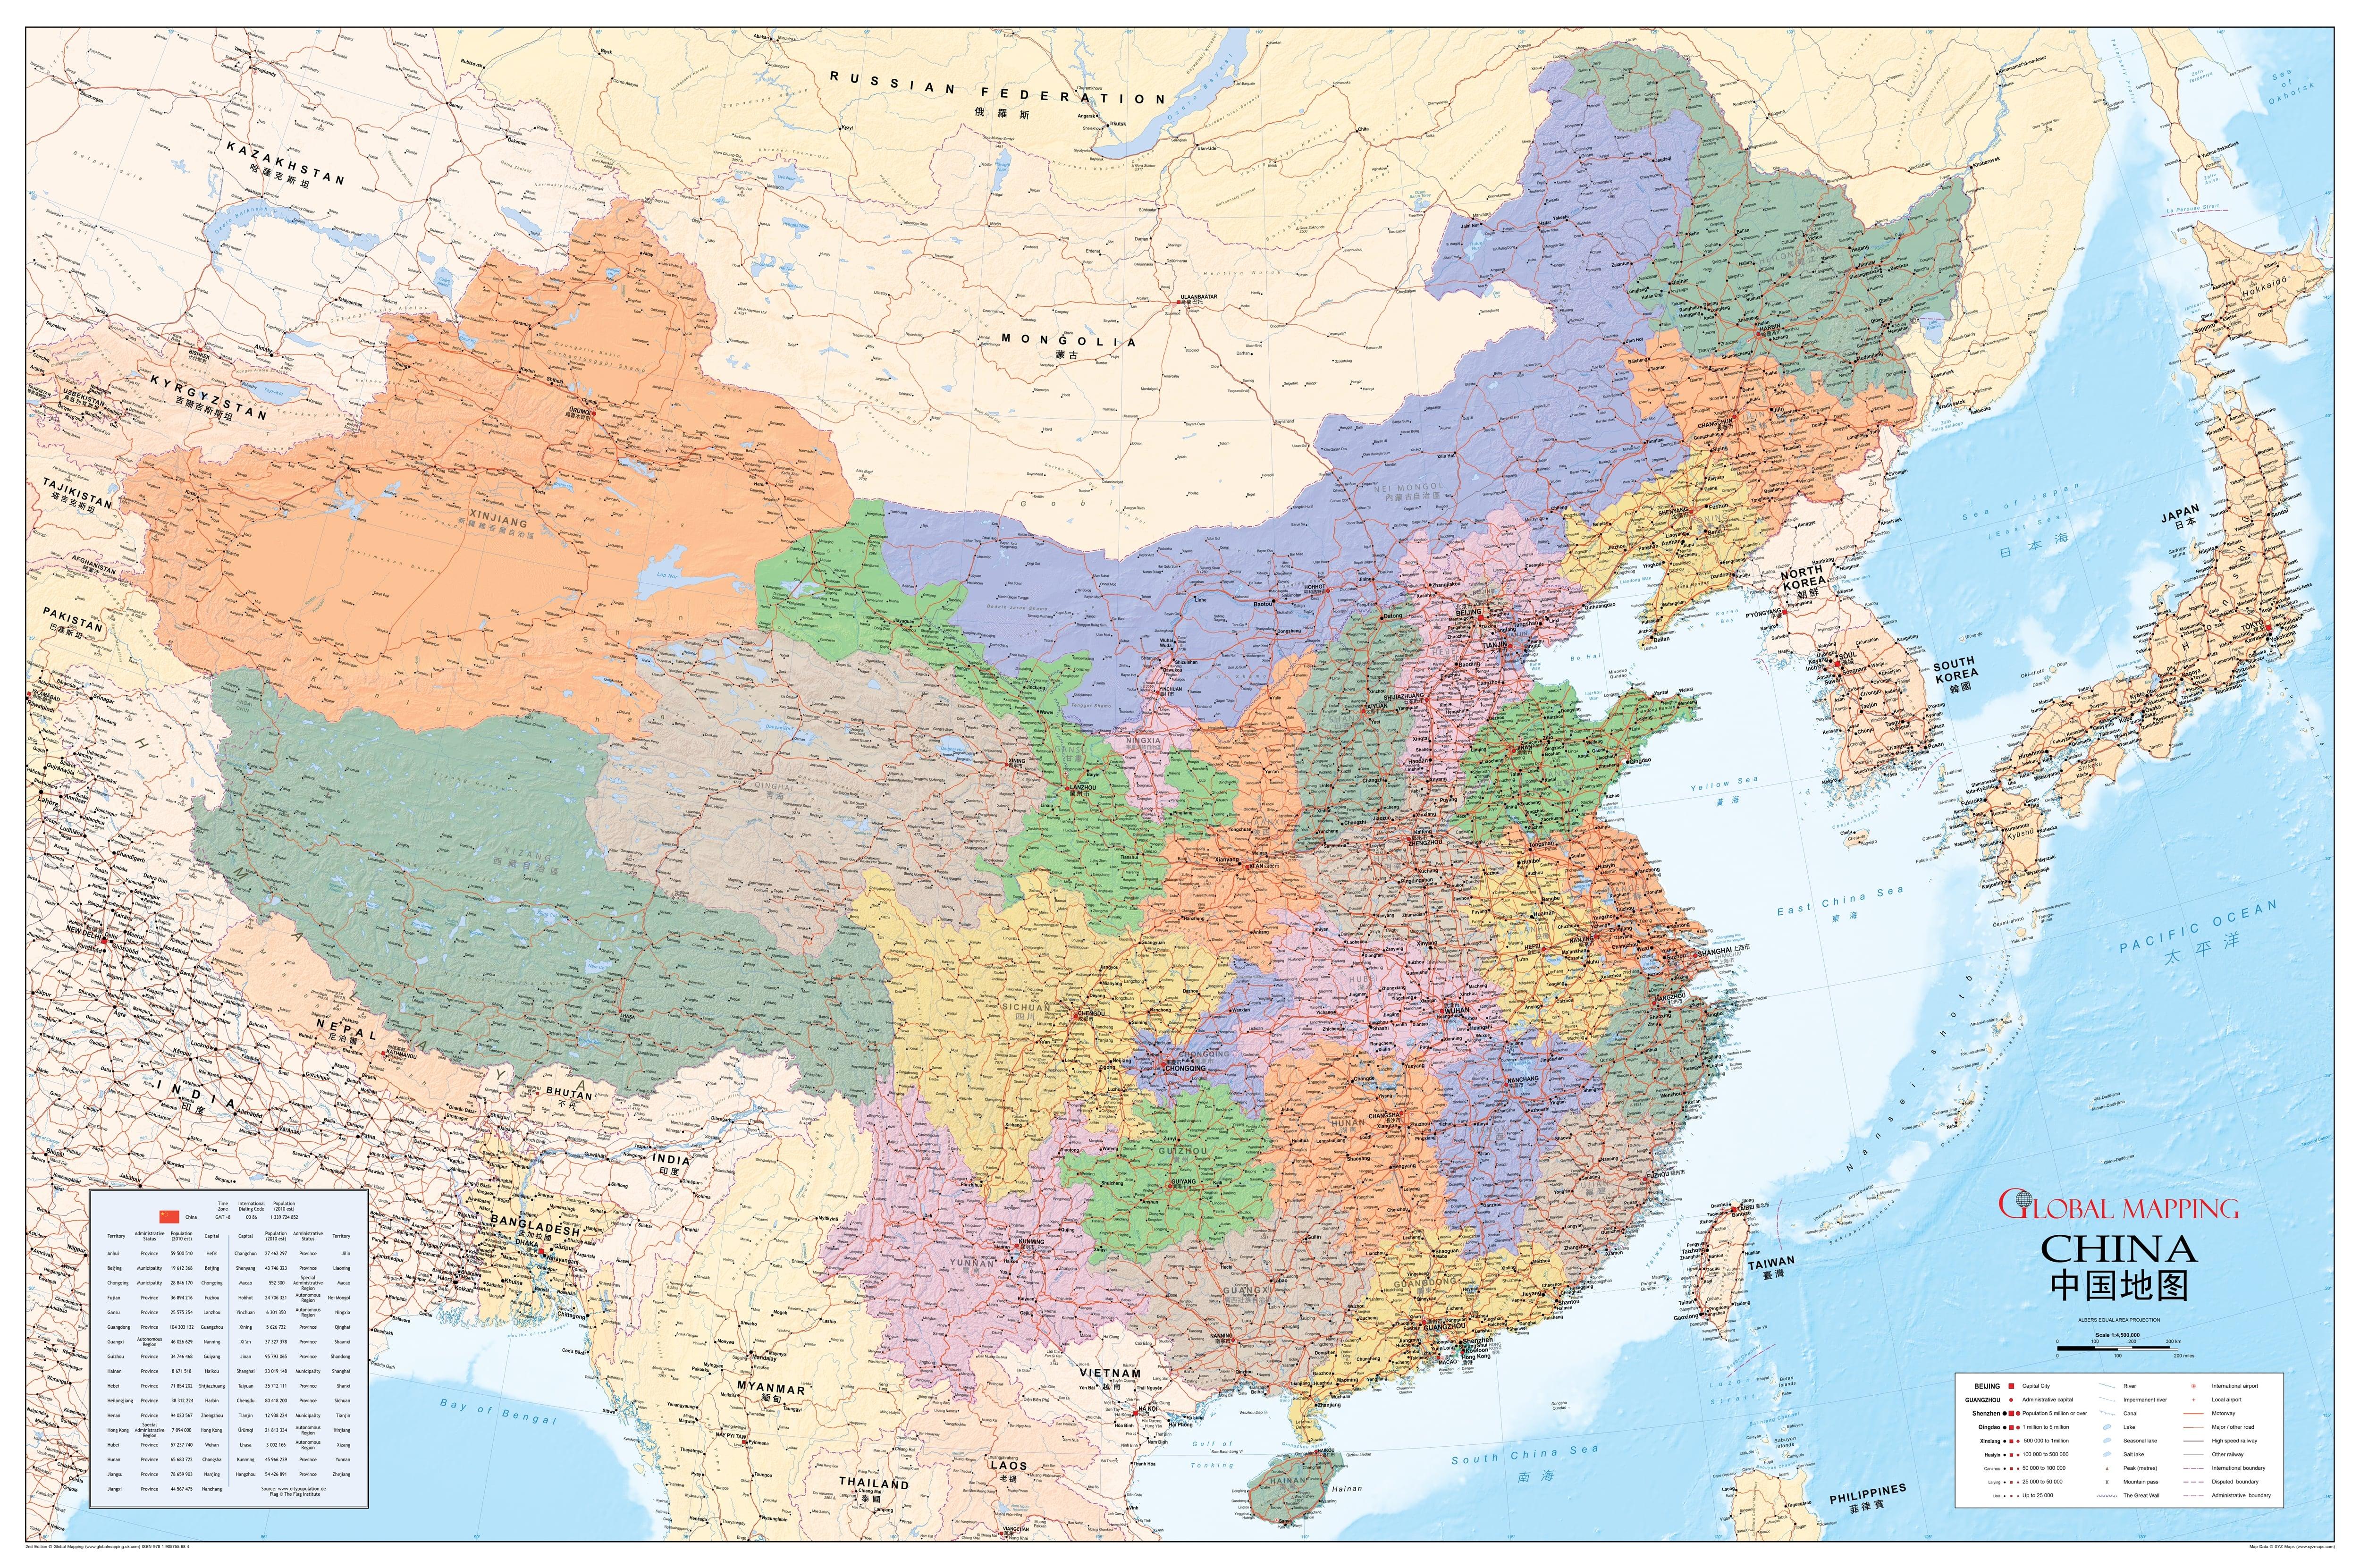 China Wall Map (GM) 140 x 94cm